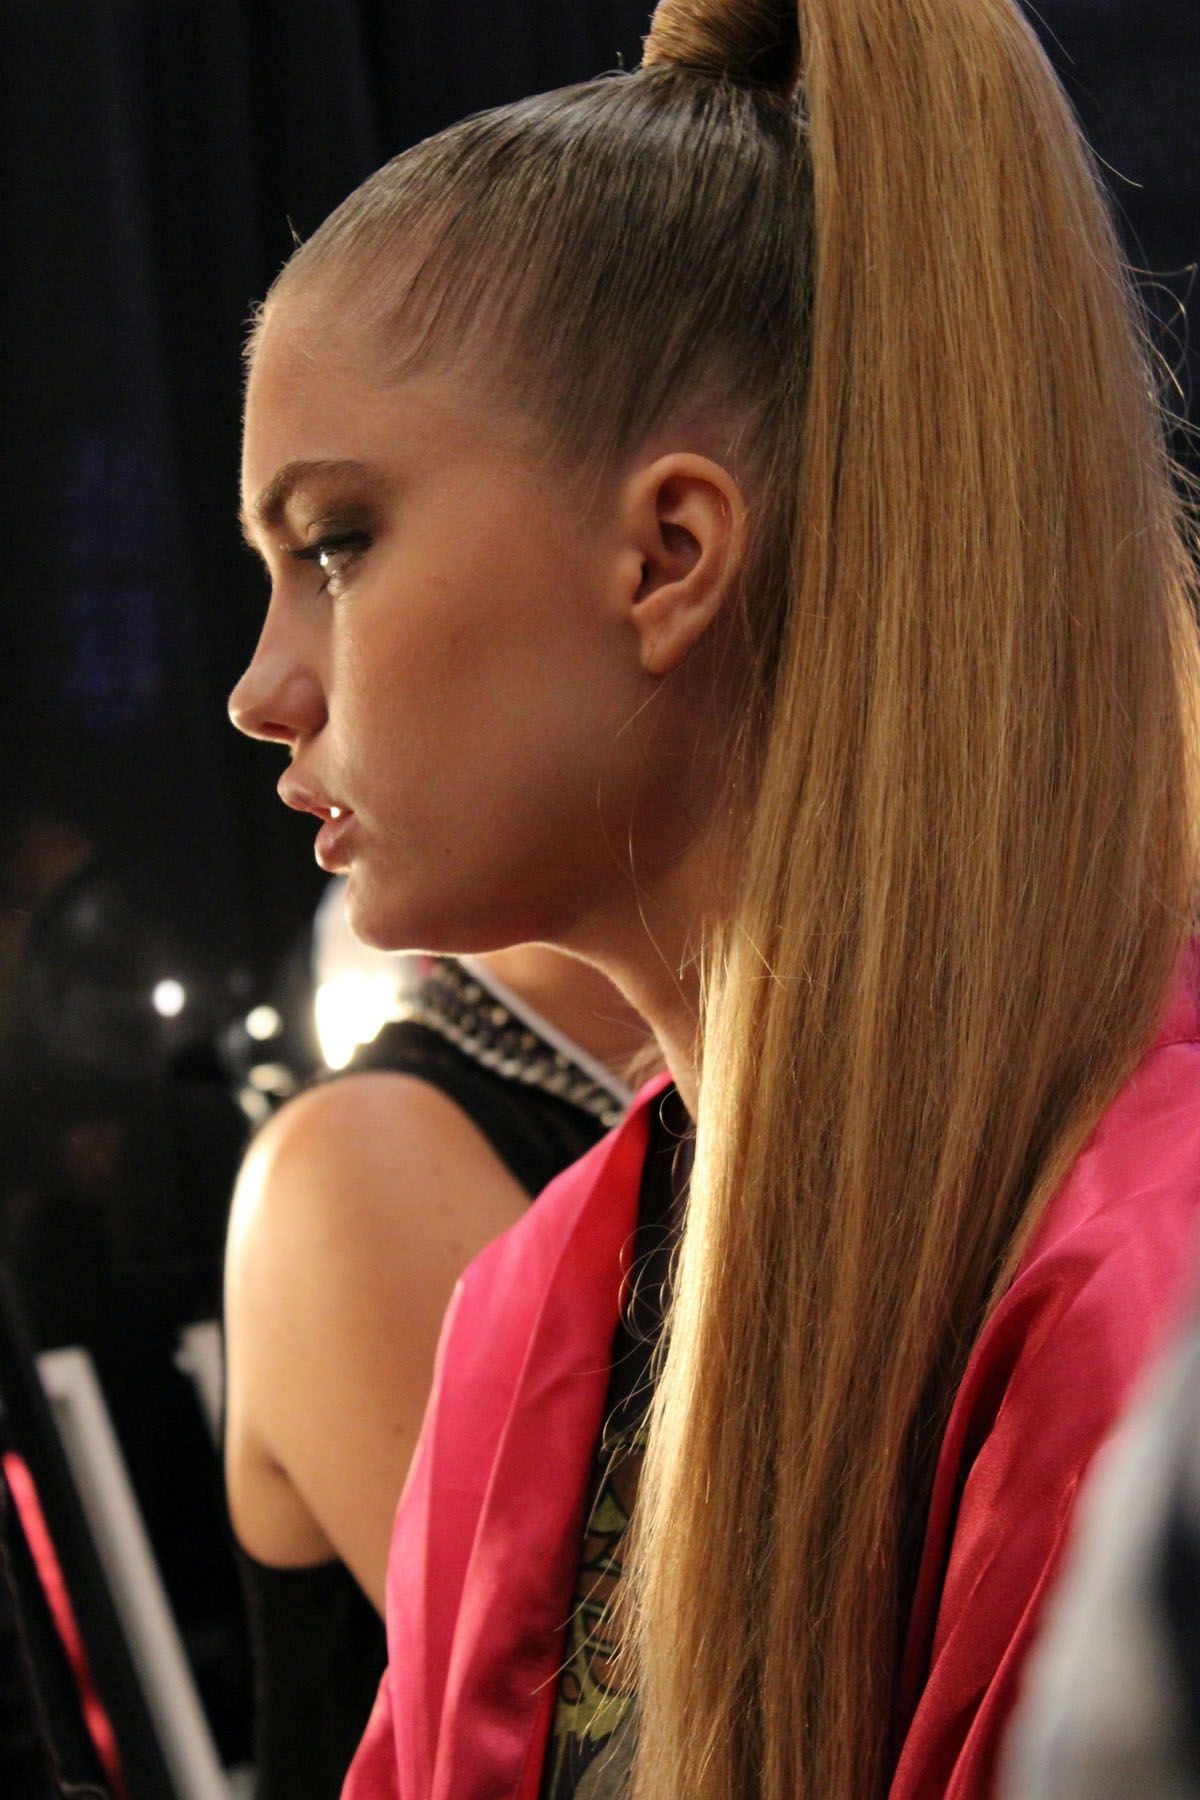 Ponytail Hairstyle Miami Beach Fashion Week Swim Sleek High Ponytail Inside Most Recent Super Sleek Ponytail Hairstyles (View 10 of 20)